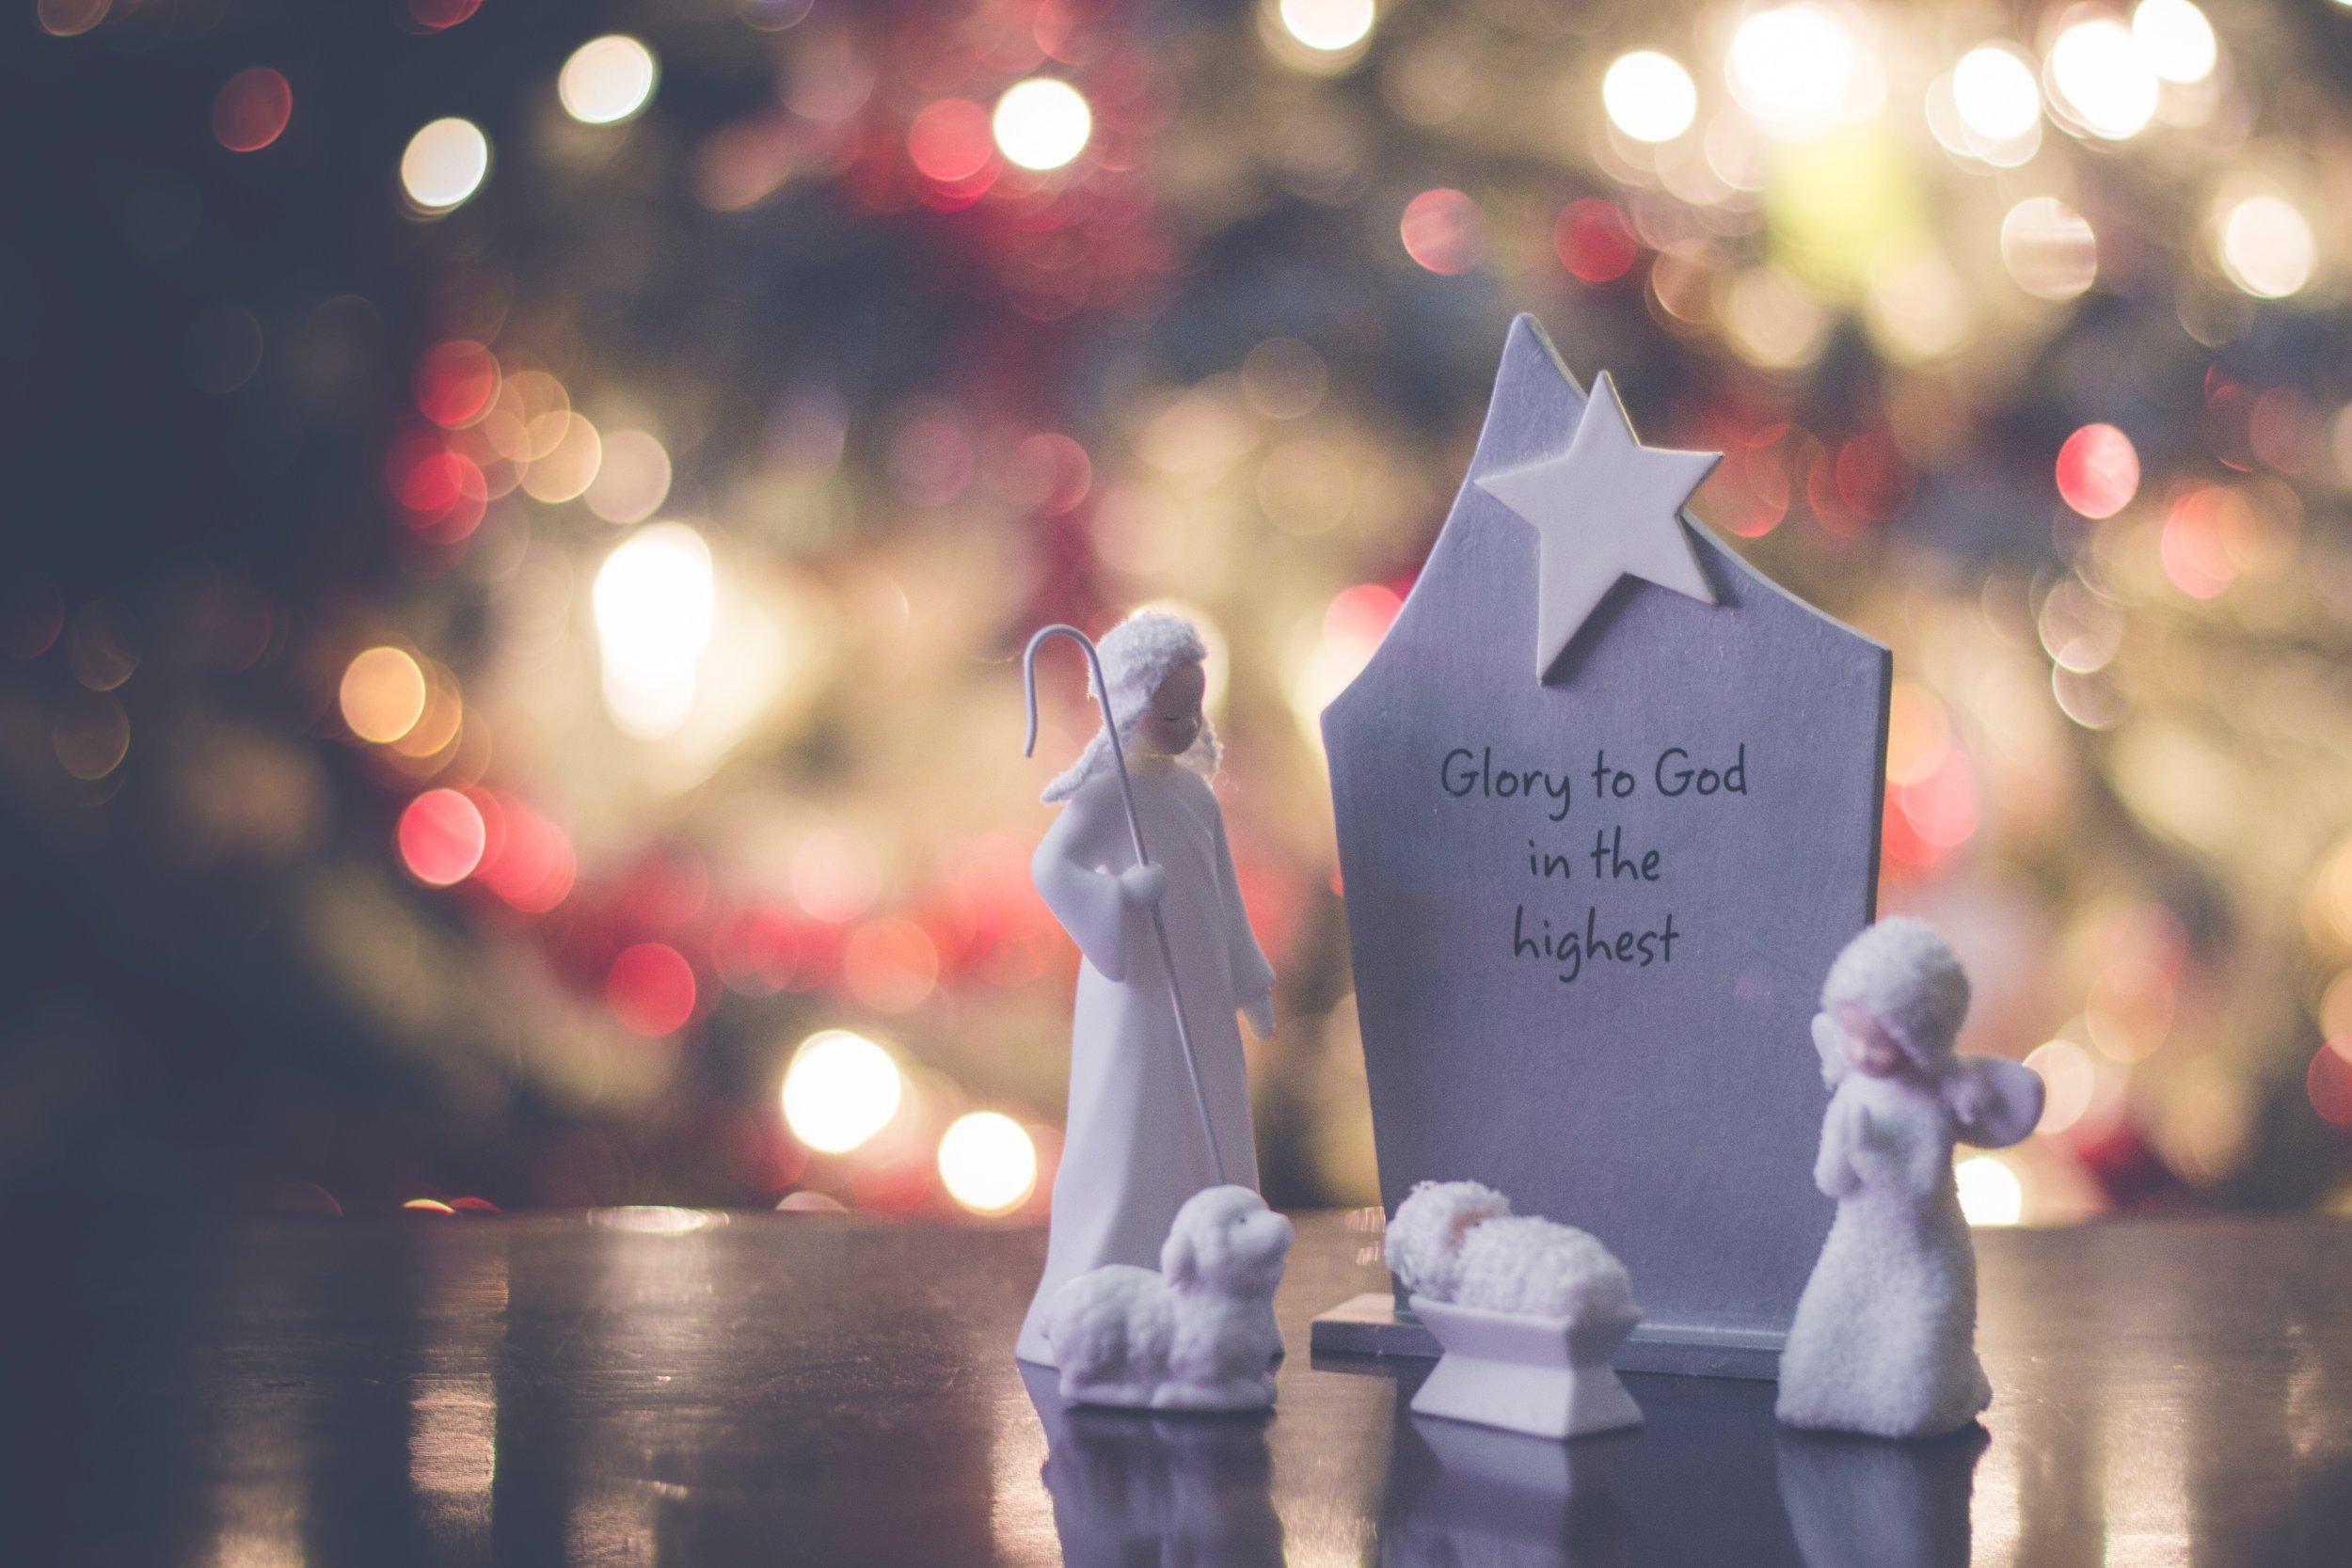 2018.12.23_Great is Thy Faithfulness_Mary Quillin.jpg